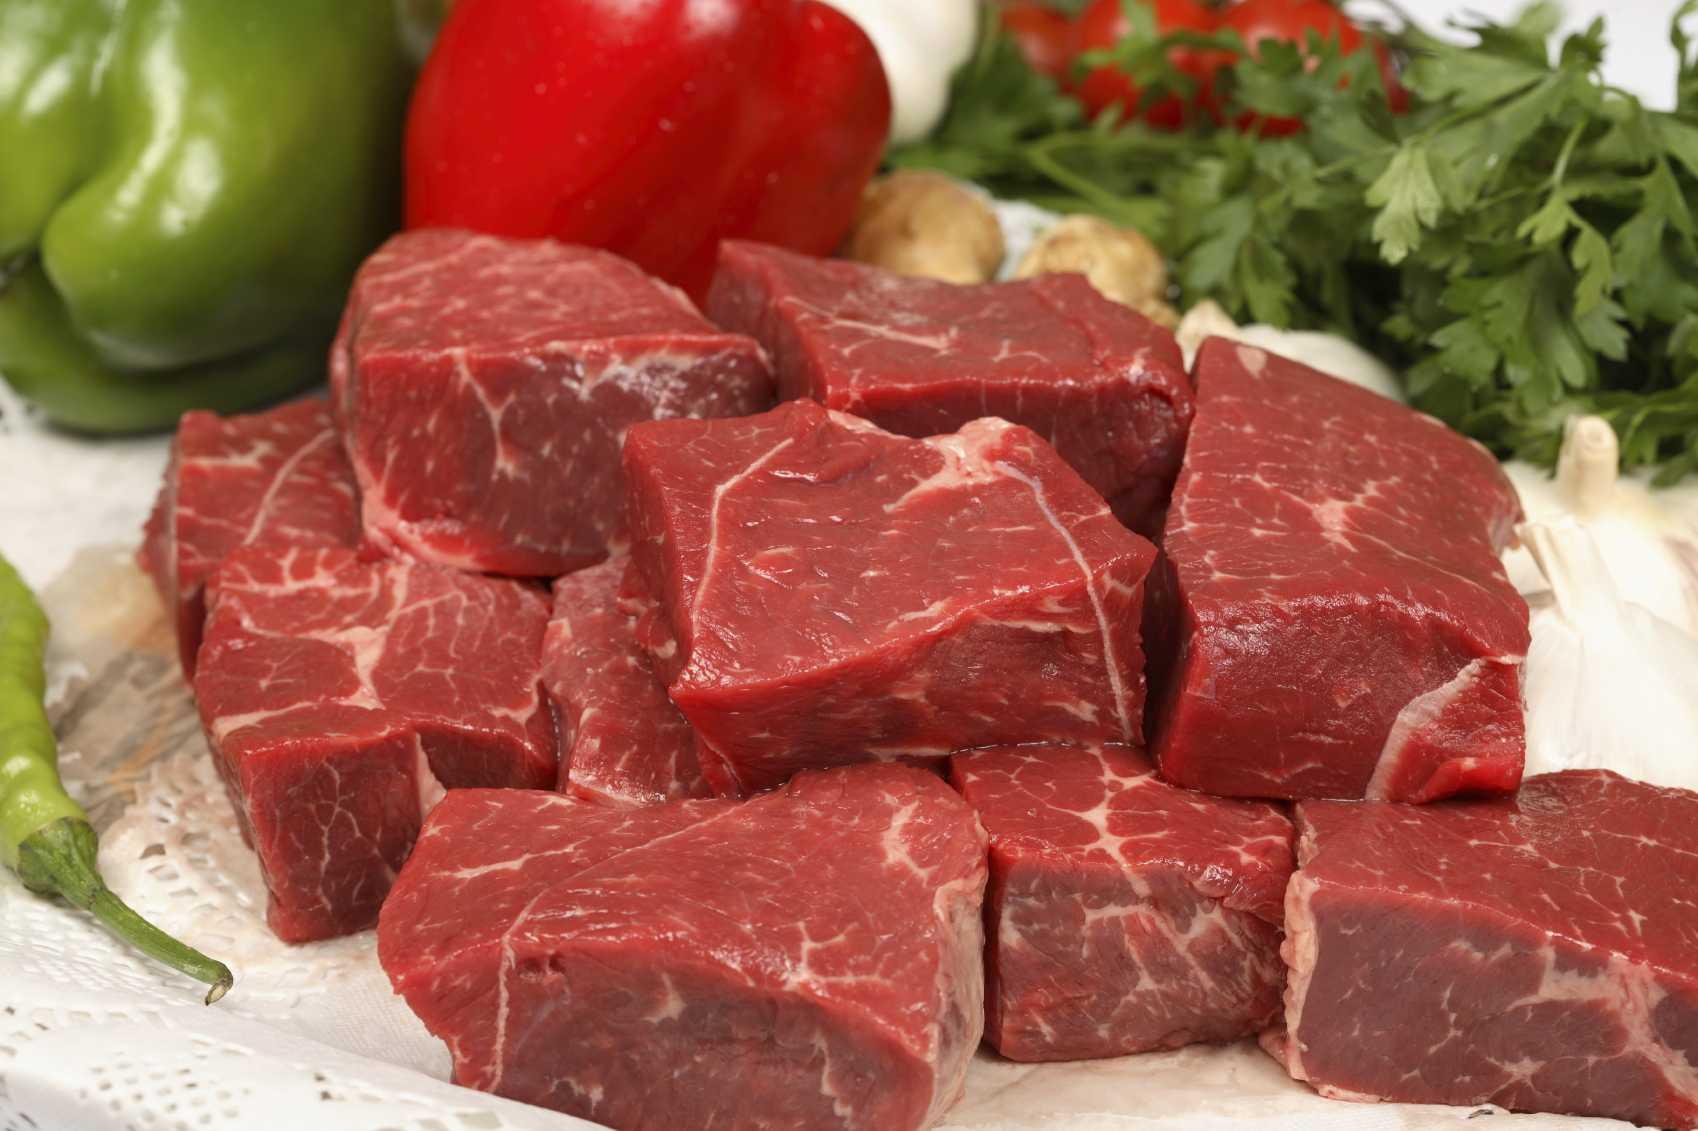 lean protein meaning in urdu